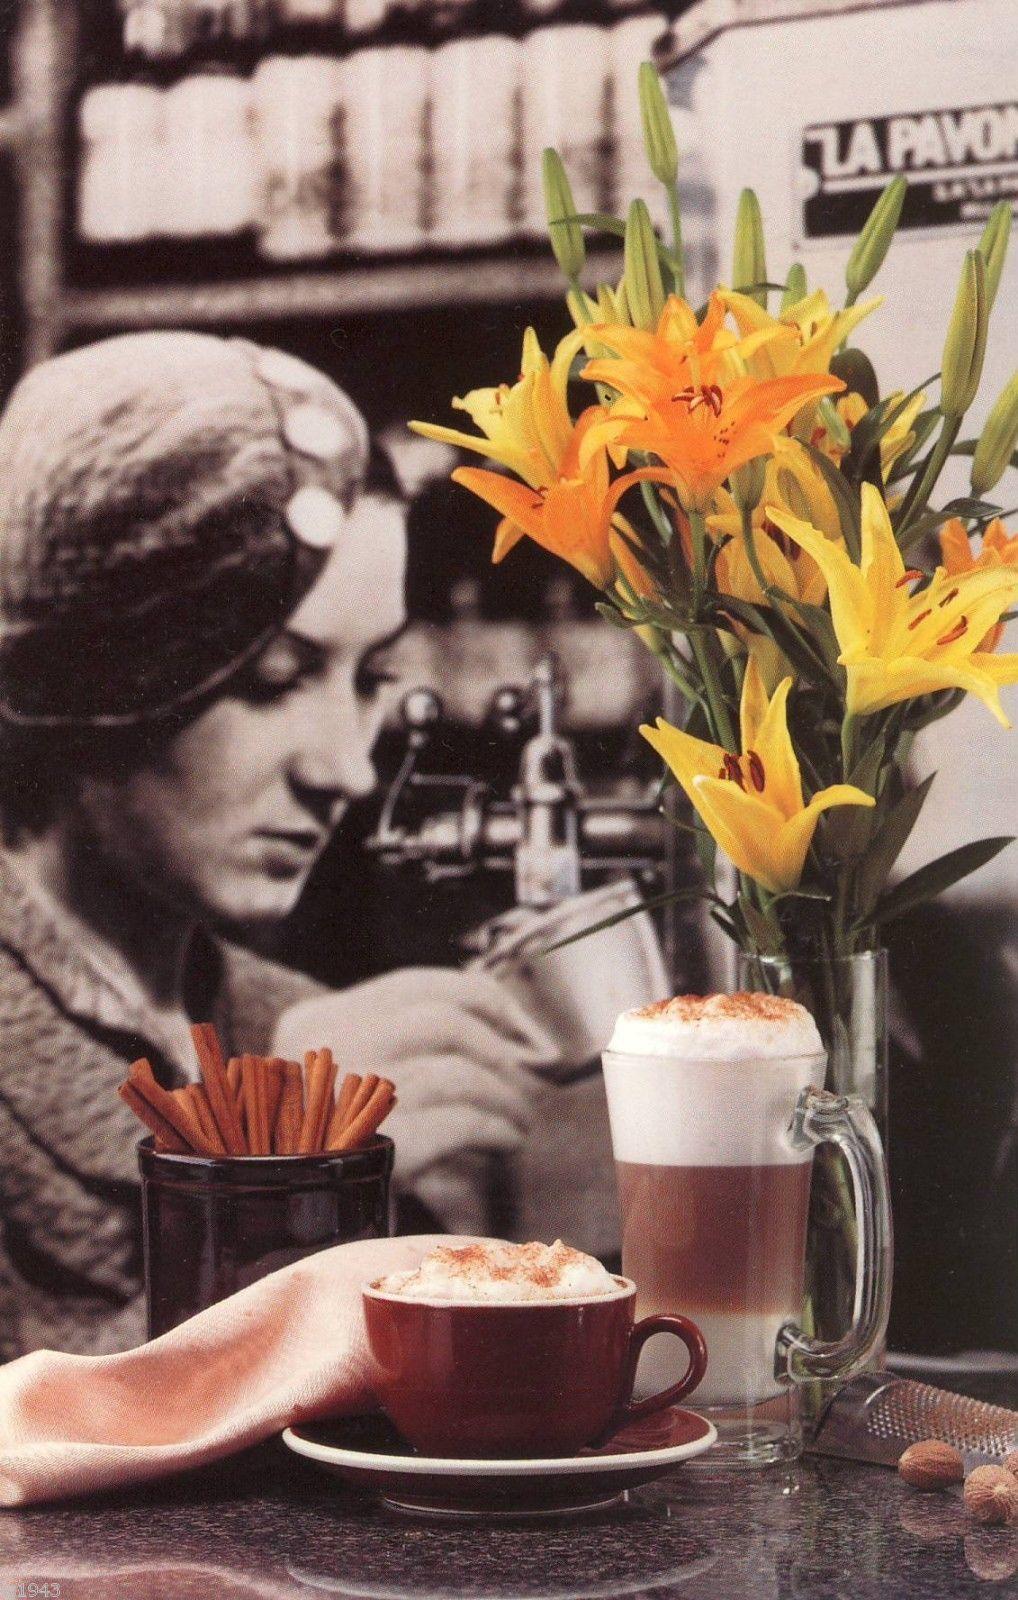 American Vintage Viennese Cinnamon Bold Roasted ground Coffee 10oz Free